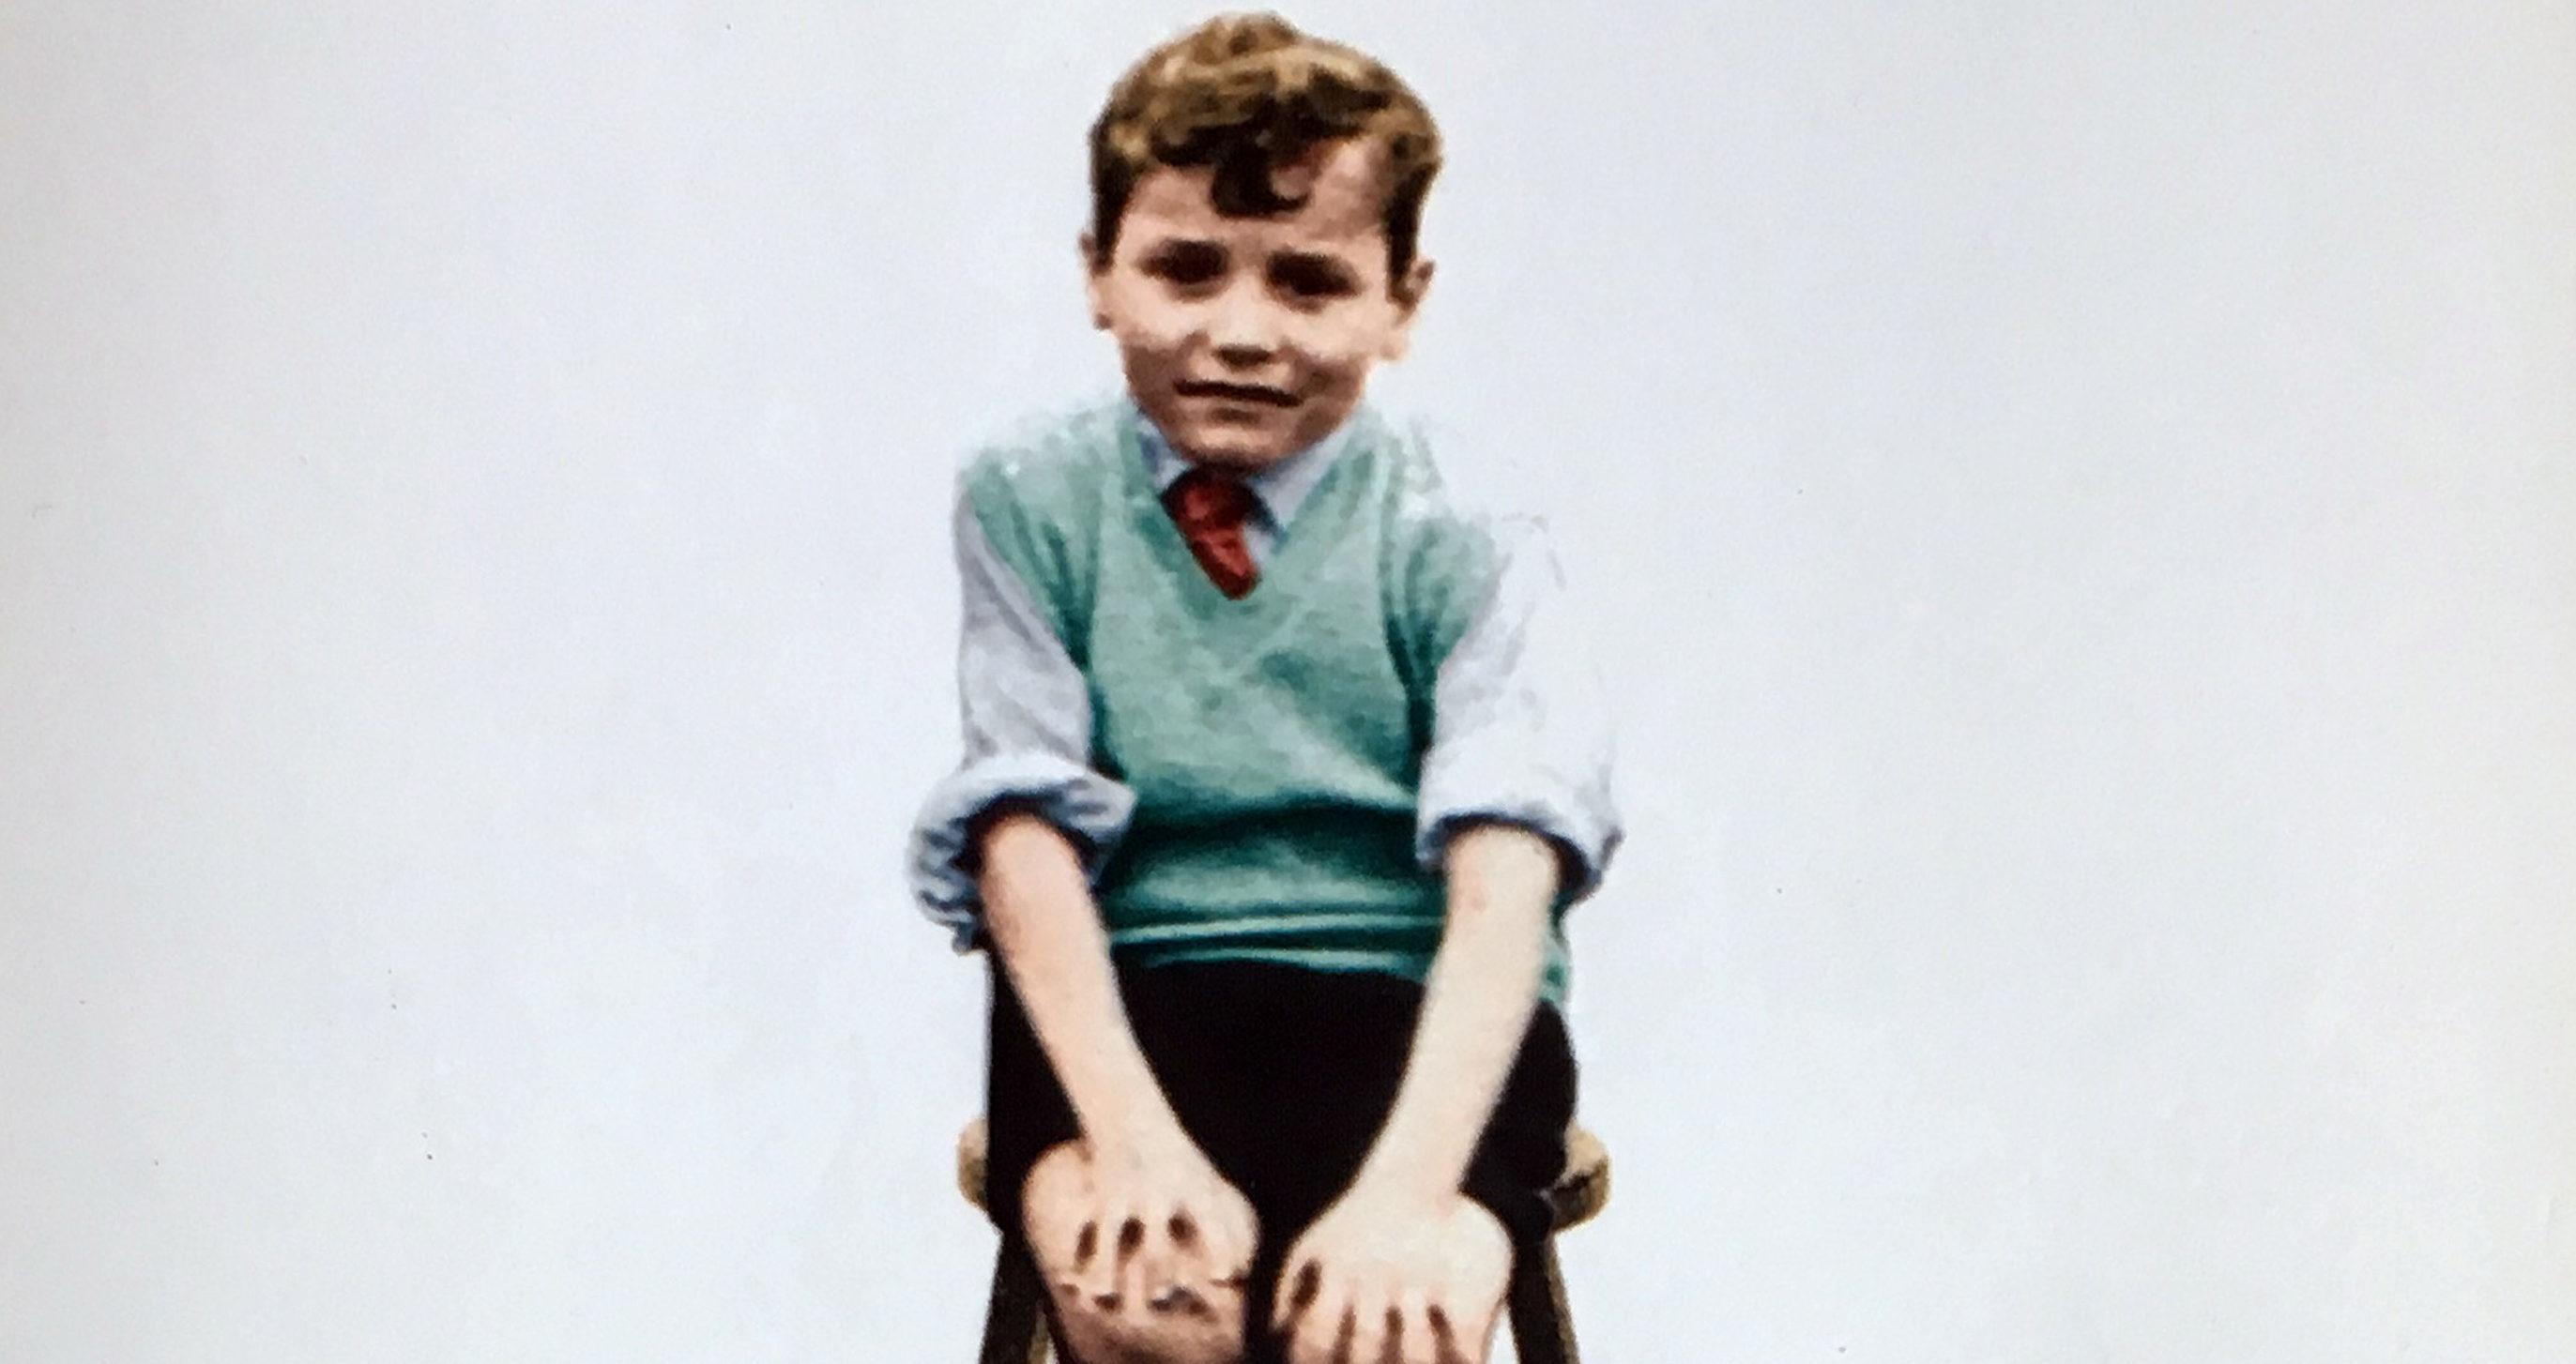 David Whelan has written a memoir about his experiences of abuse.